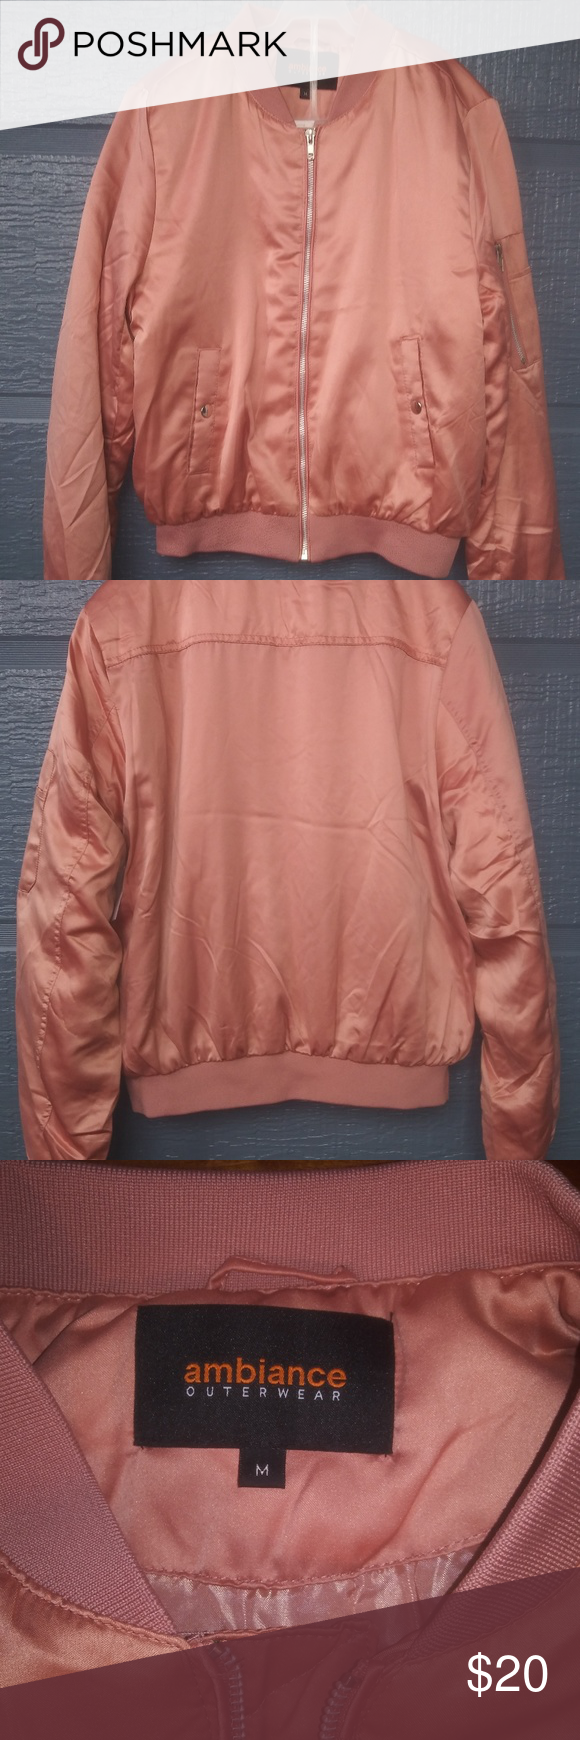 Ambiance Outerwear Bomber Jacket Mauve M New Bomber Jacket Jackets Clothes Design [ 1740 x 580 Pixel ]